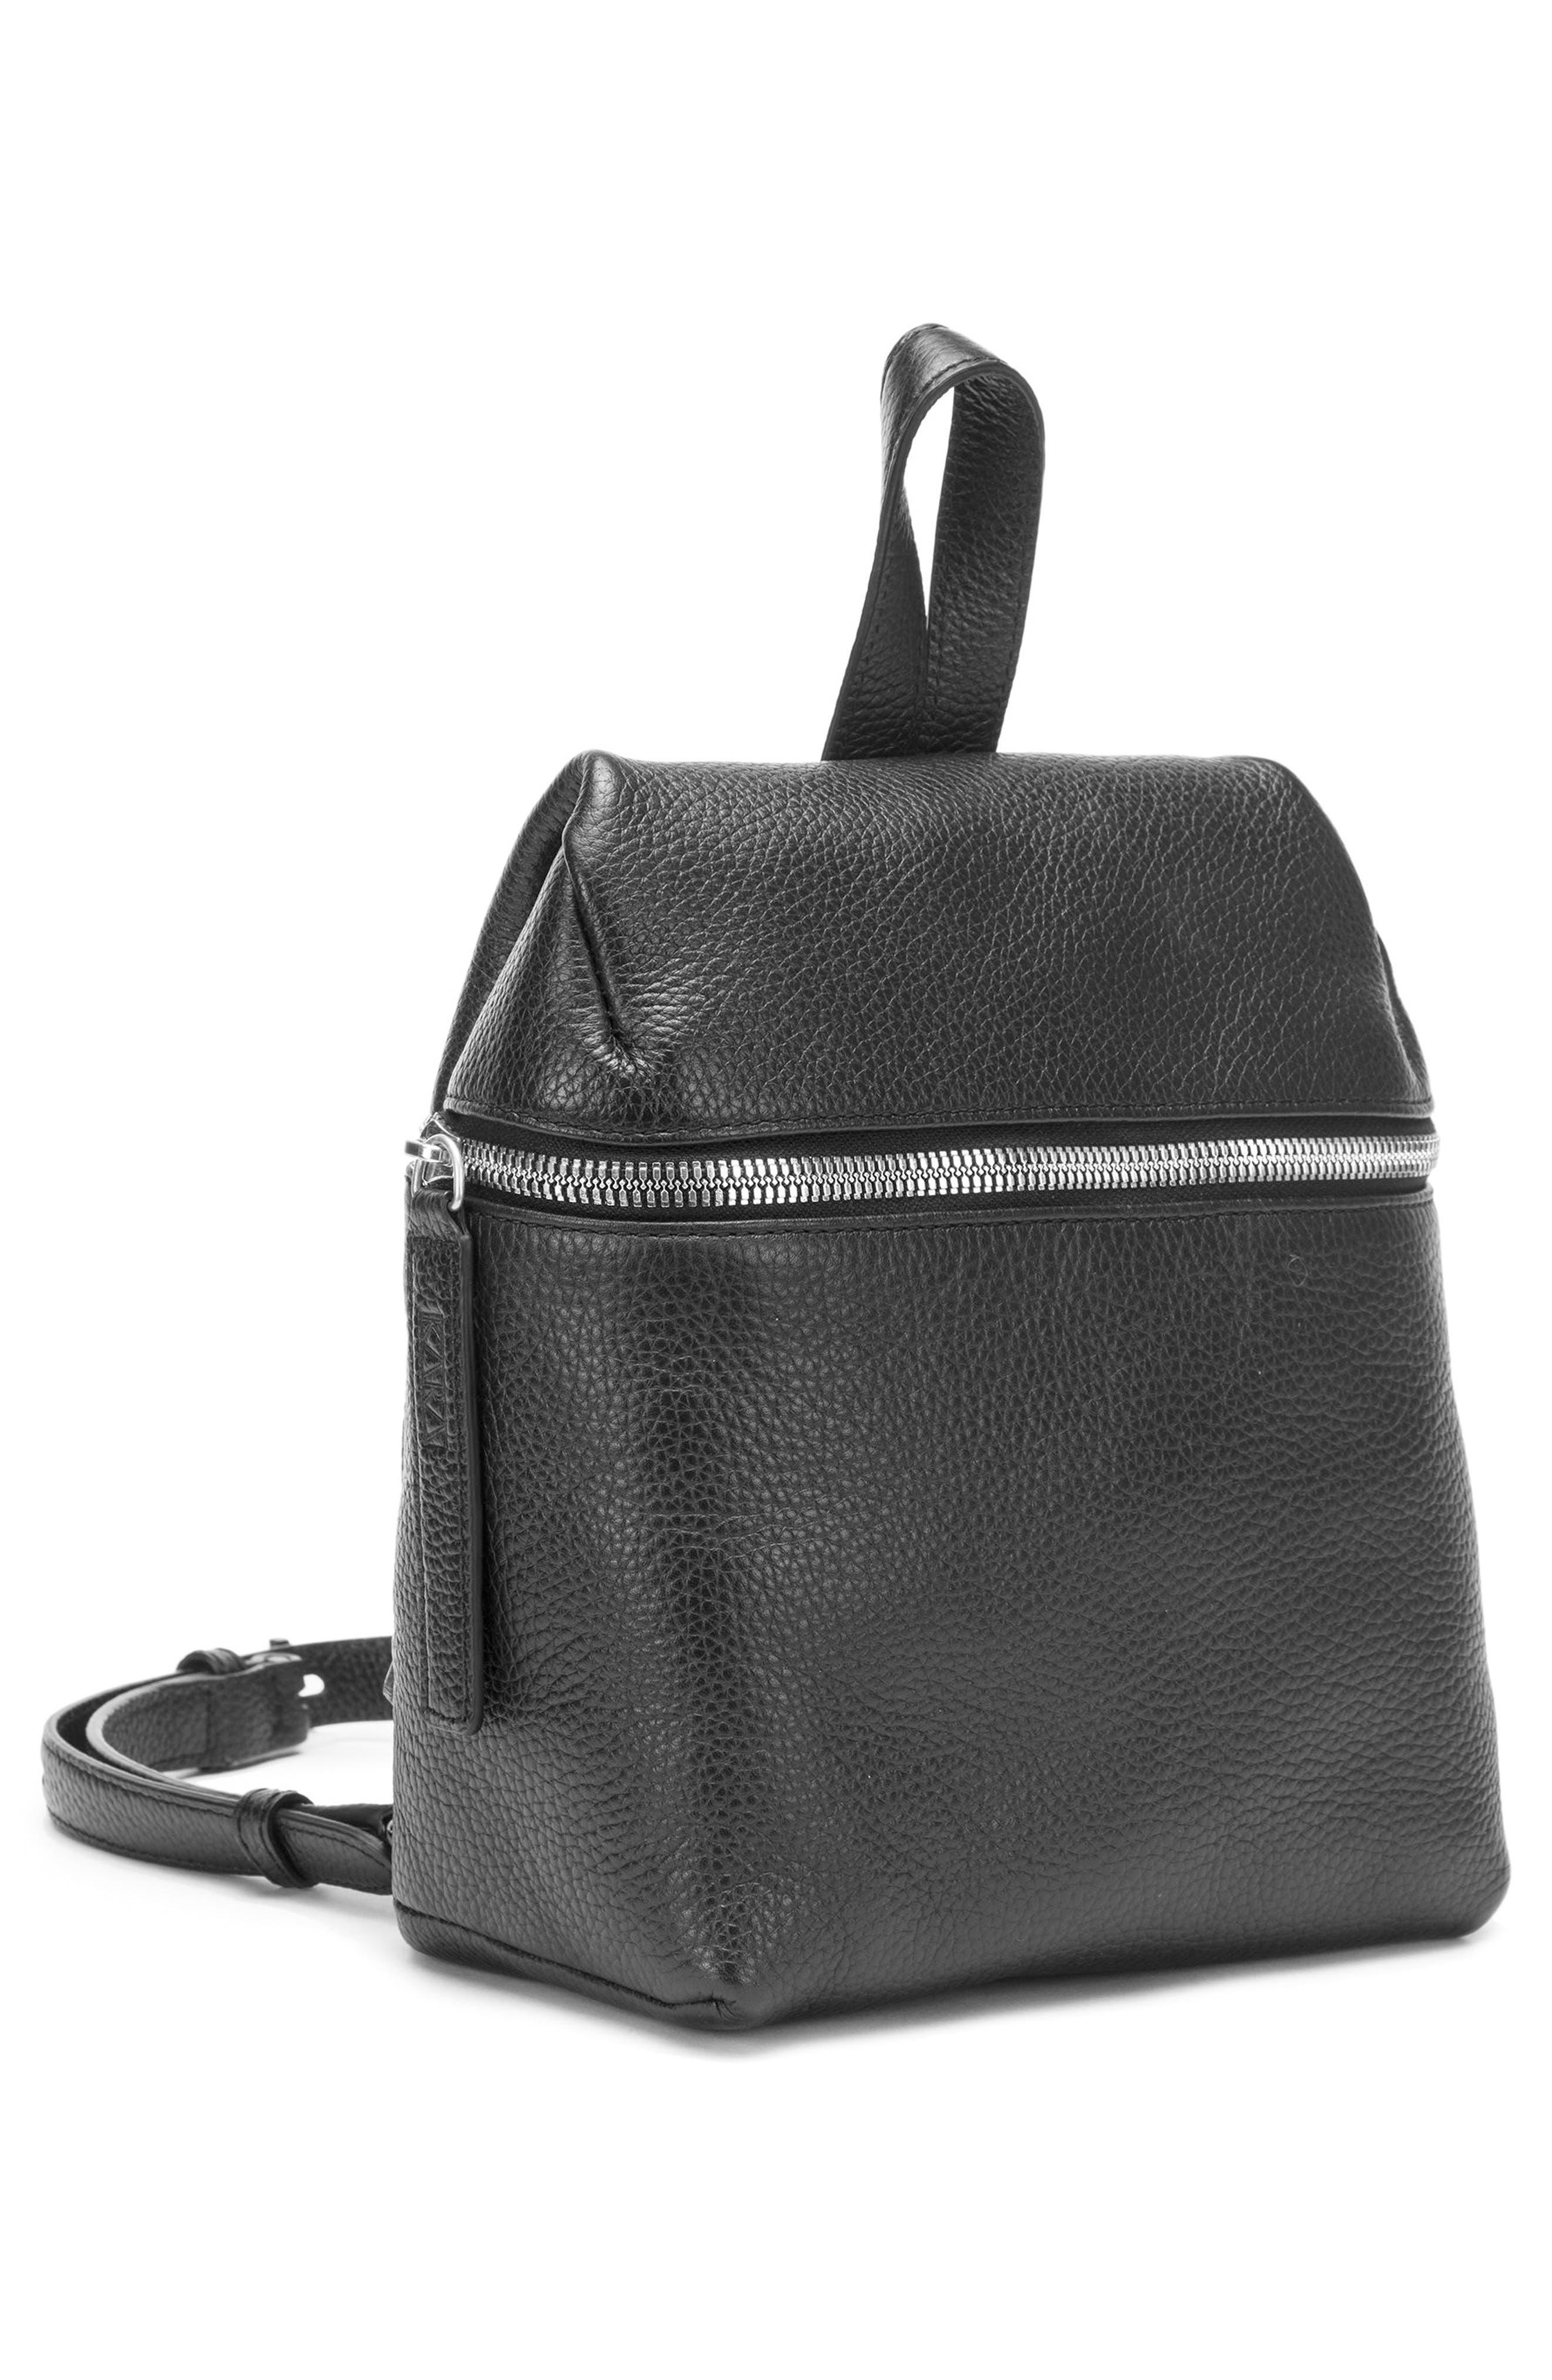 Alternate Image 3  - KARA Small Pebbled Leather Backpack